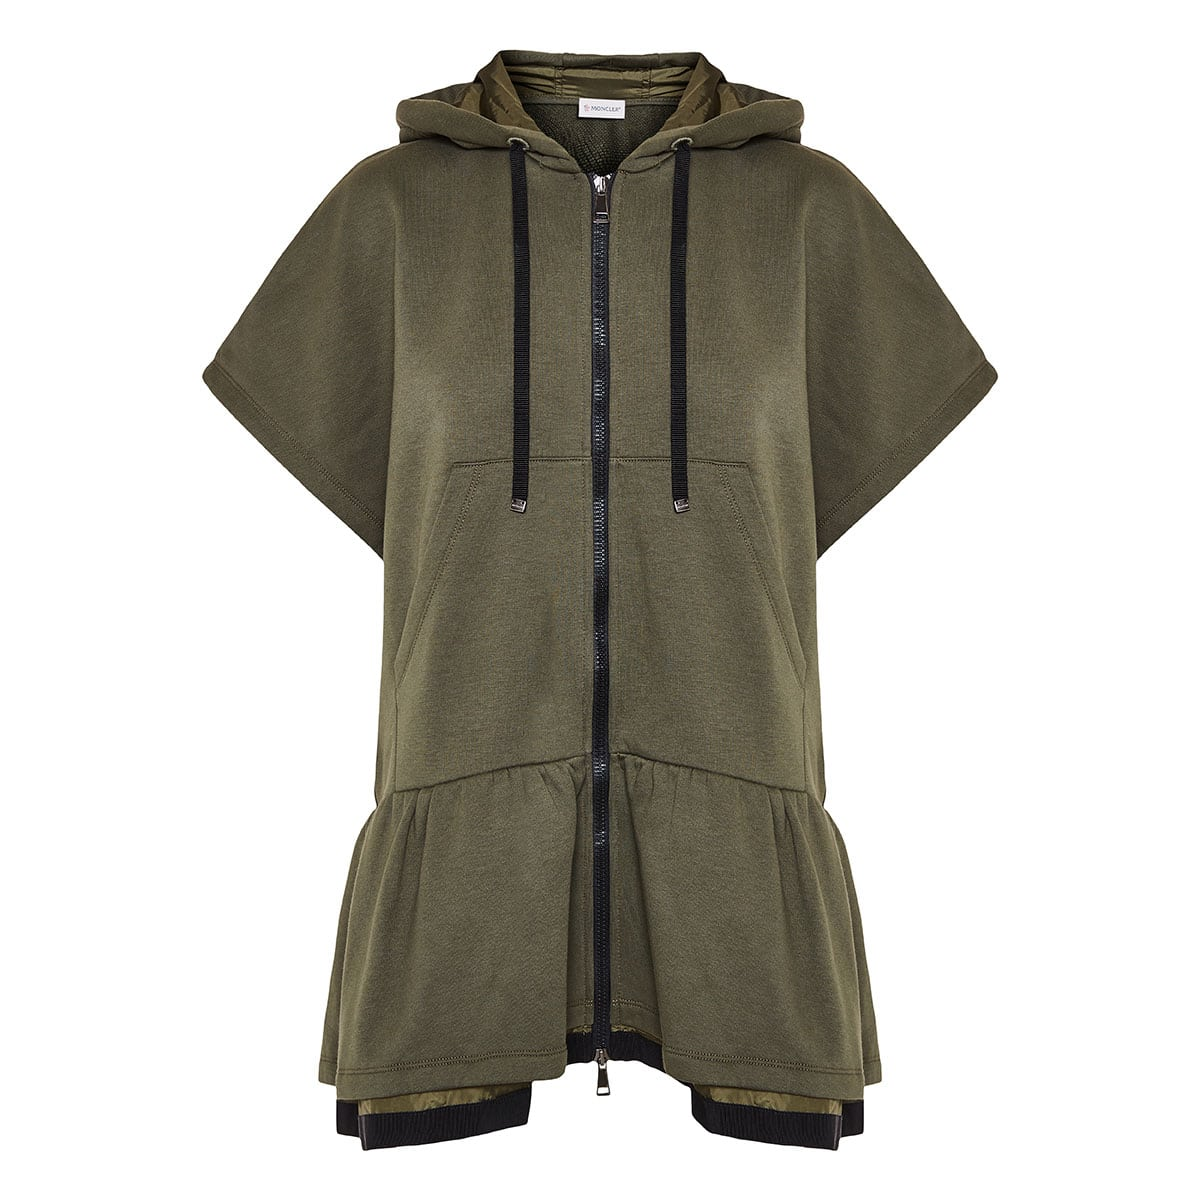 Oversized ruffled zipper hoodie